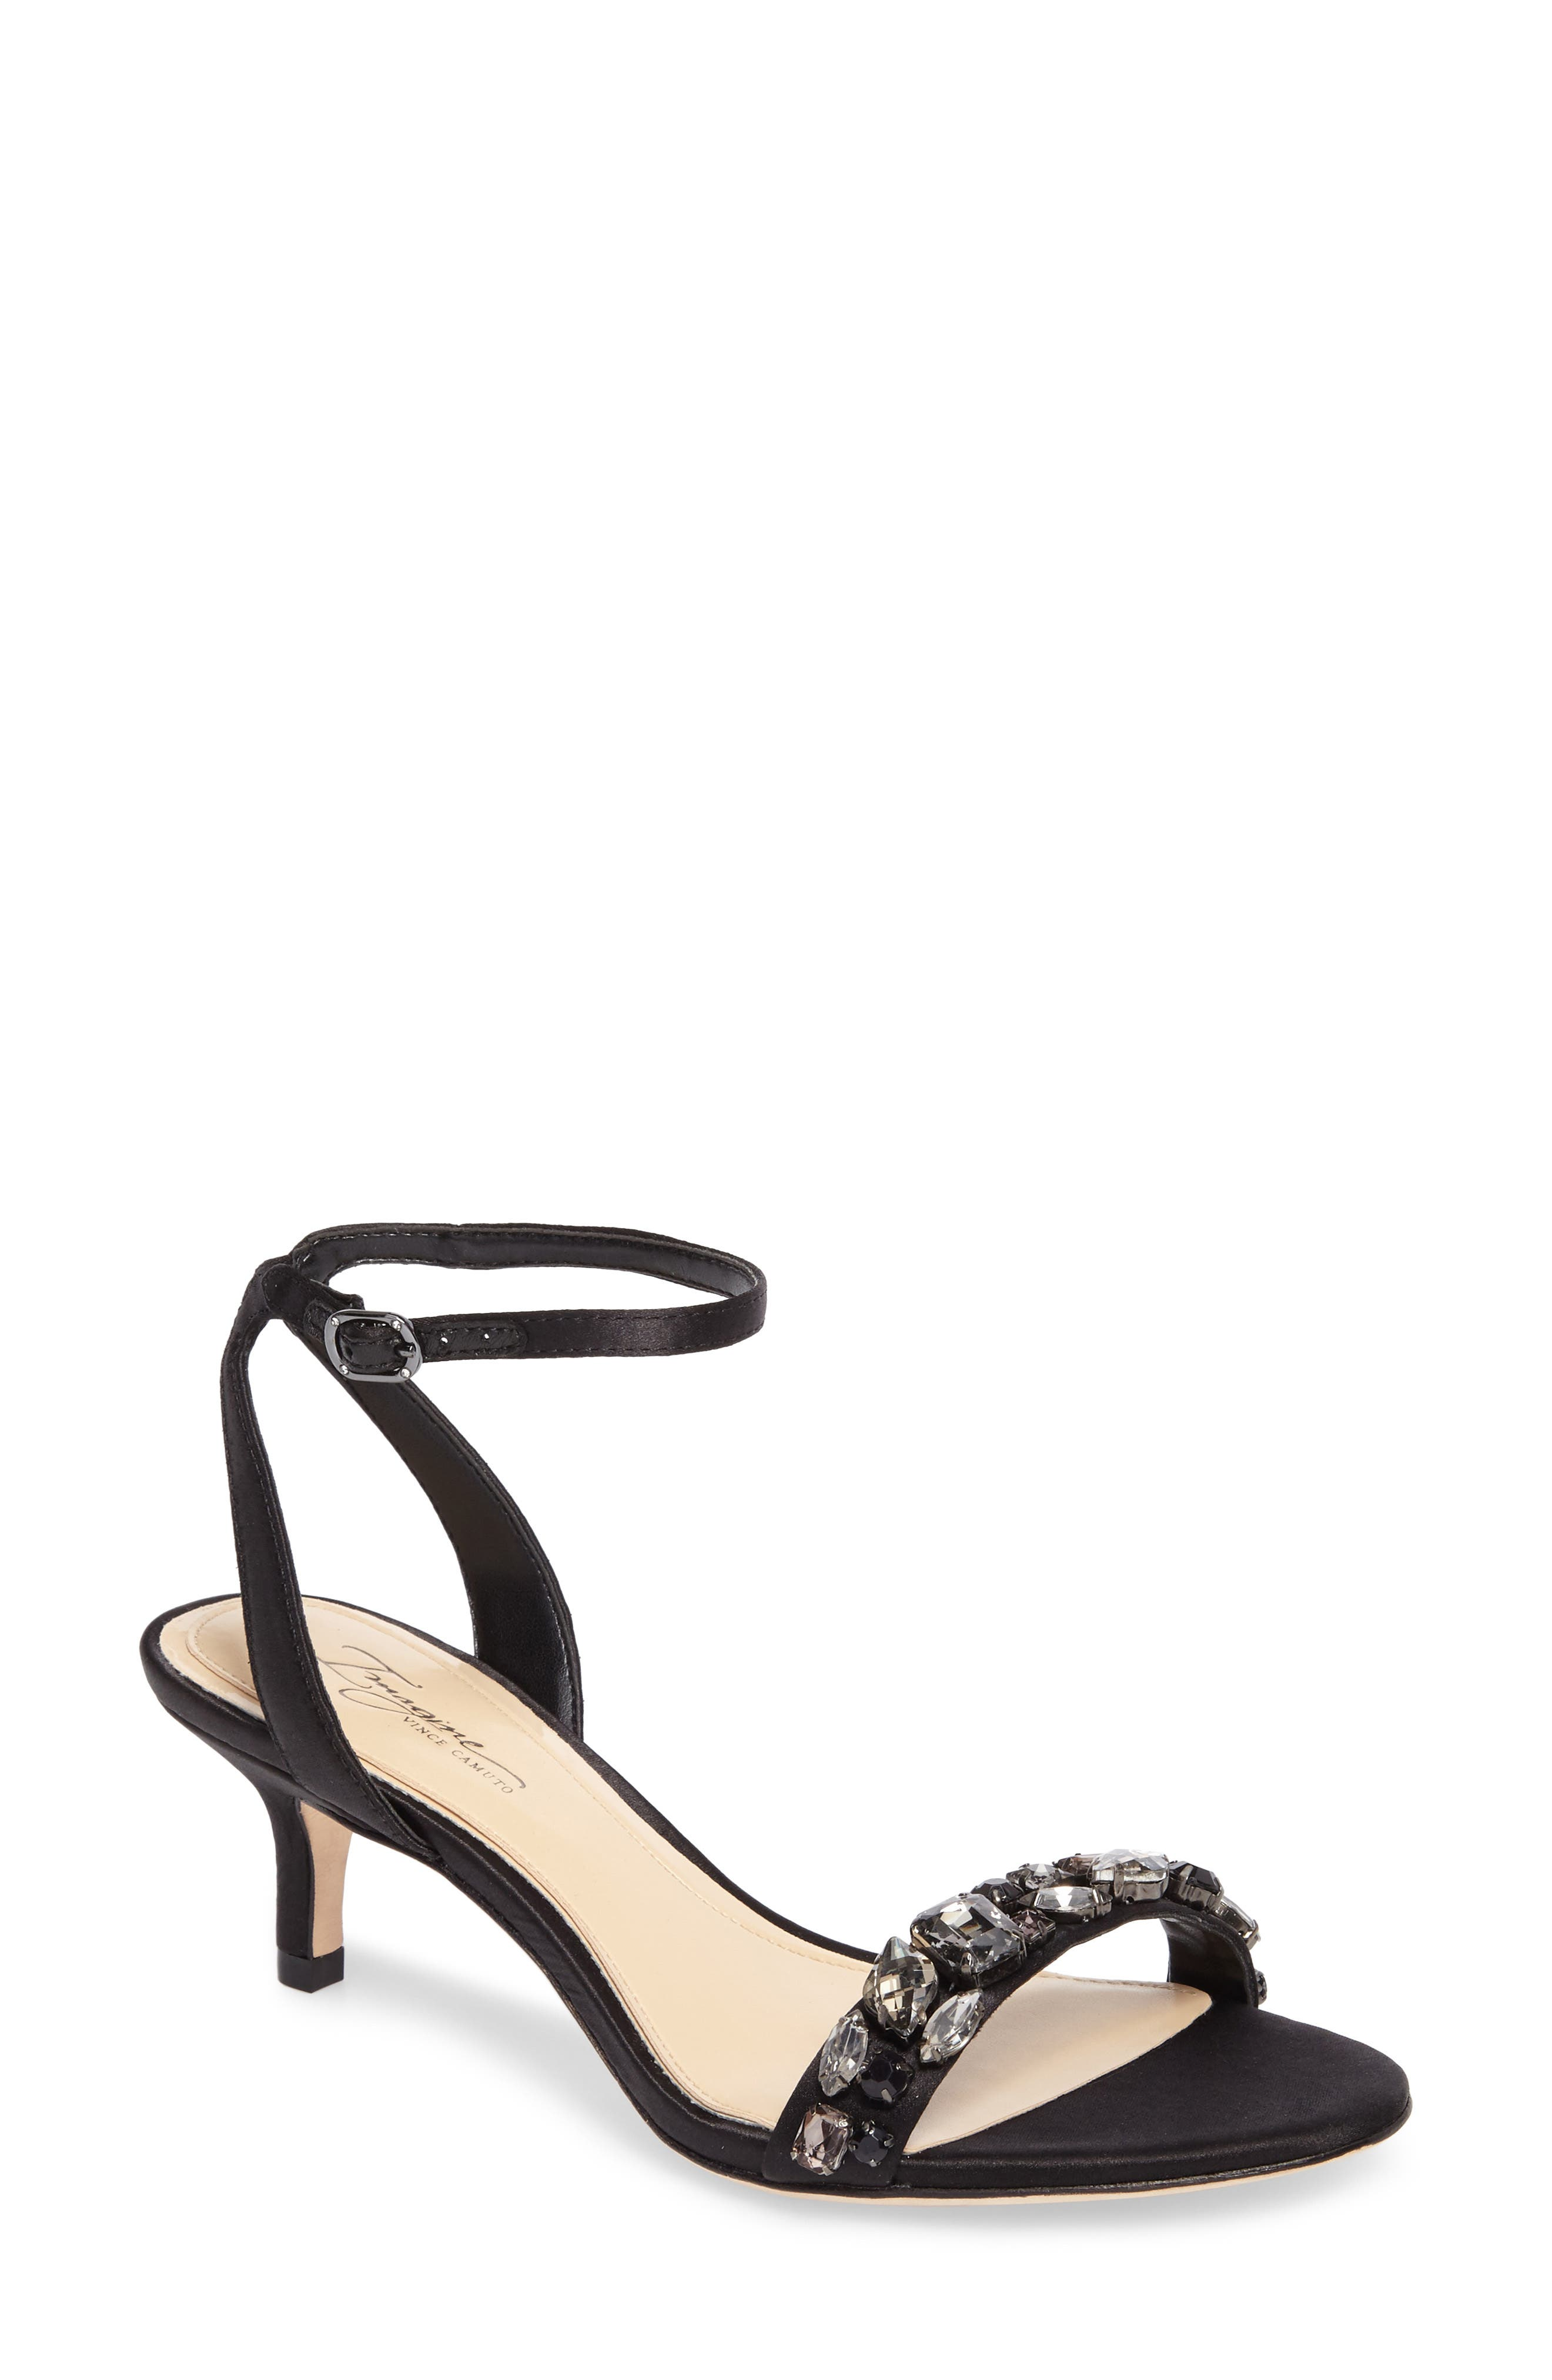 Imagine Vince Camuto Kolo Embellished Kitten Heel Sandal,                             Main thumbnail 1, color,                             Black Satin